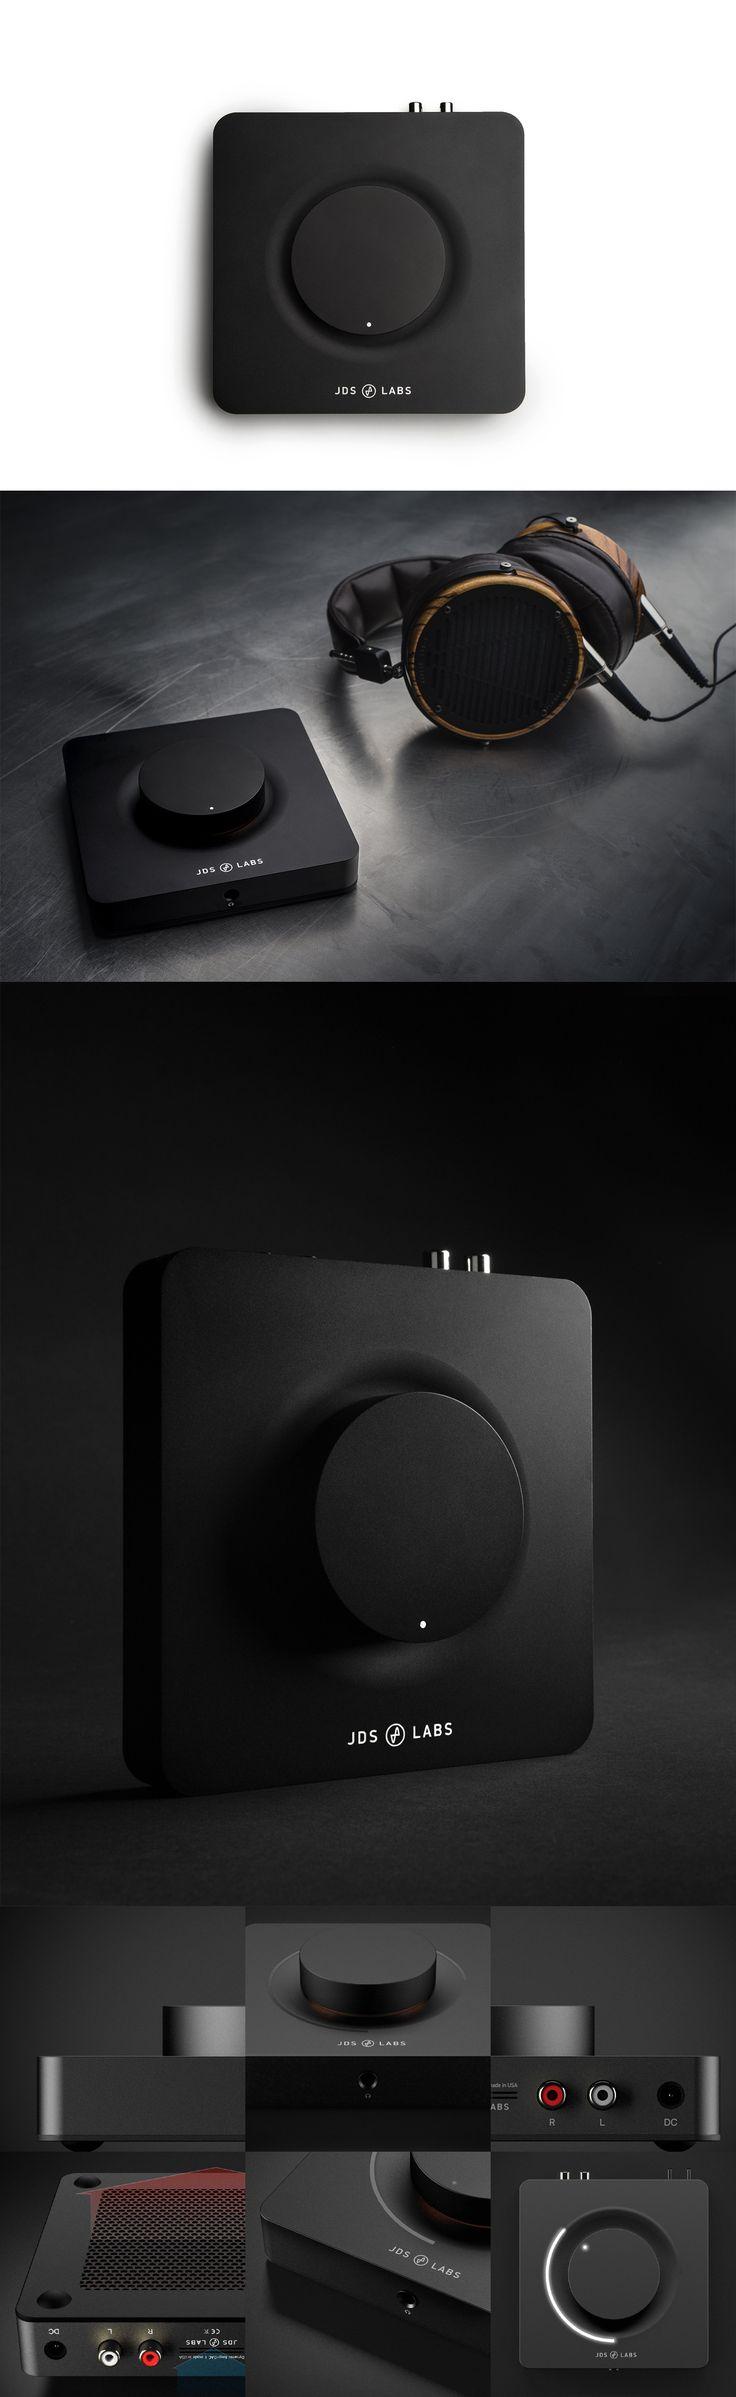 The personal portfolio site of french product designer Elie Ahovi.